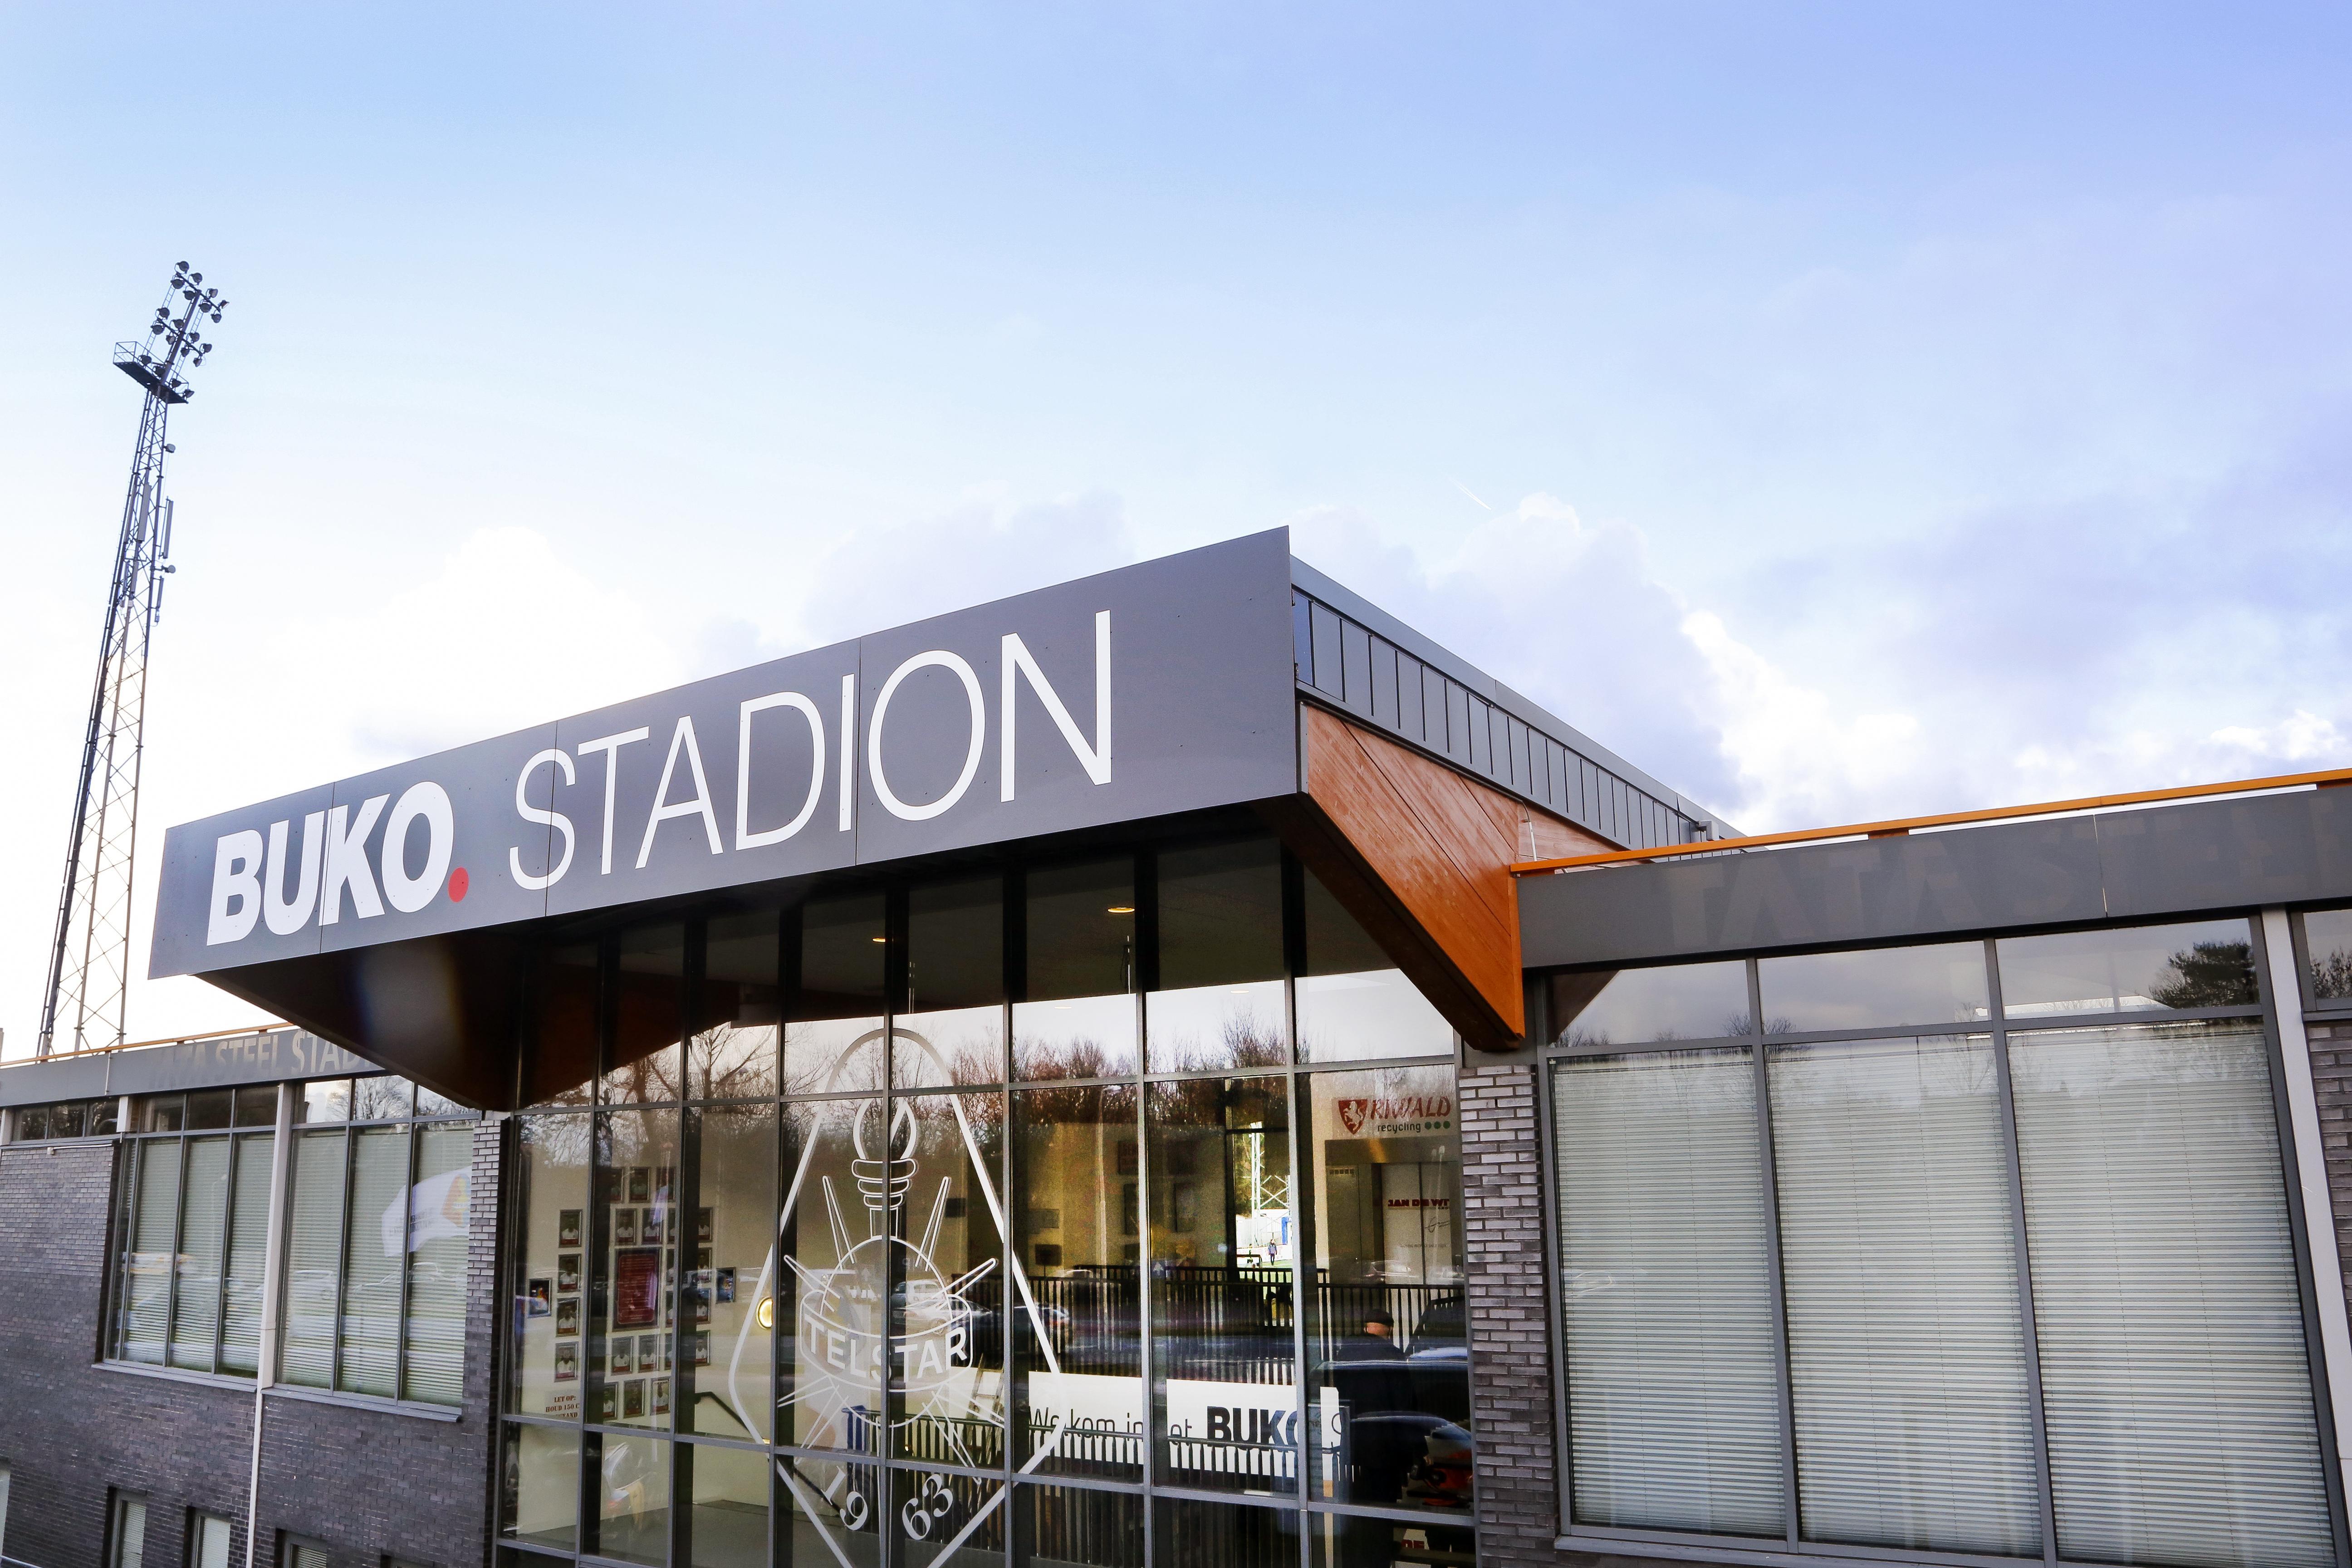 Buko nieuwe hoofdsponsor van Telstar tot in elk geval 2023: 'Buko Stadion, het bekt lekker'